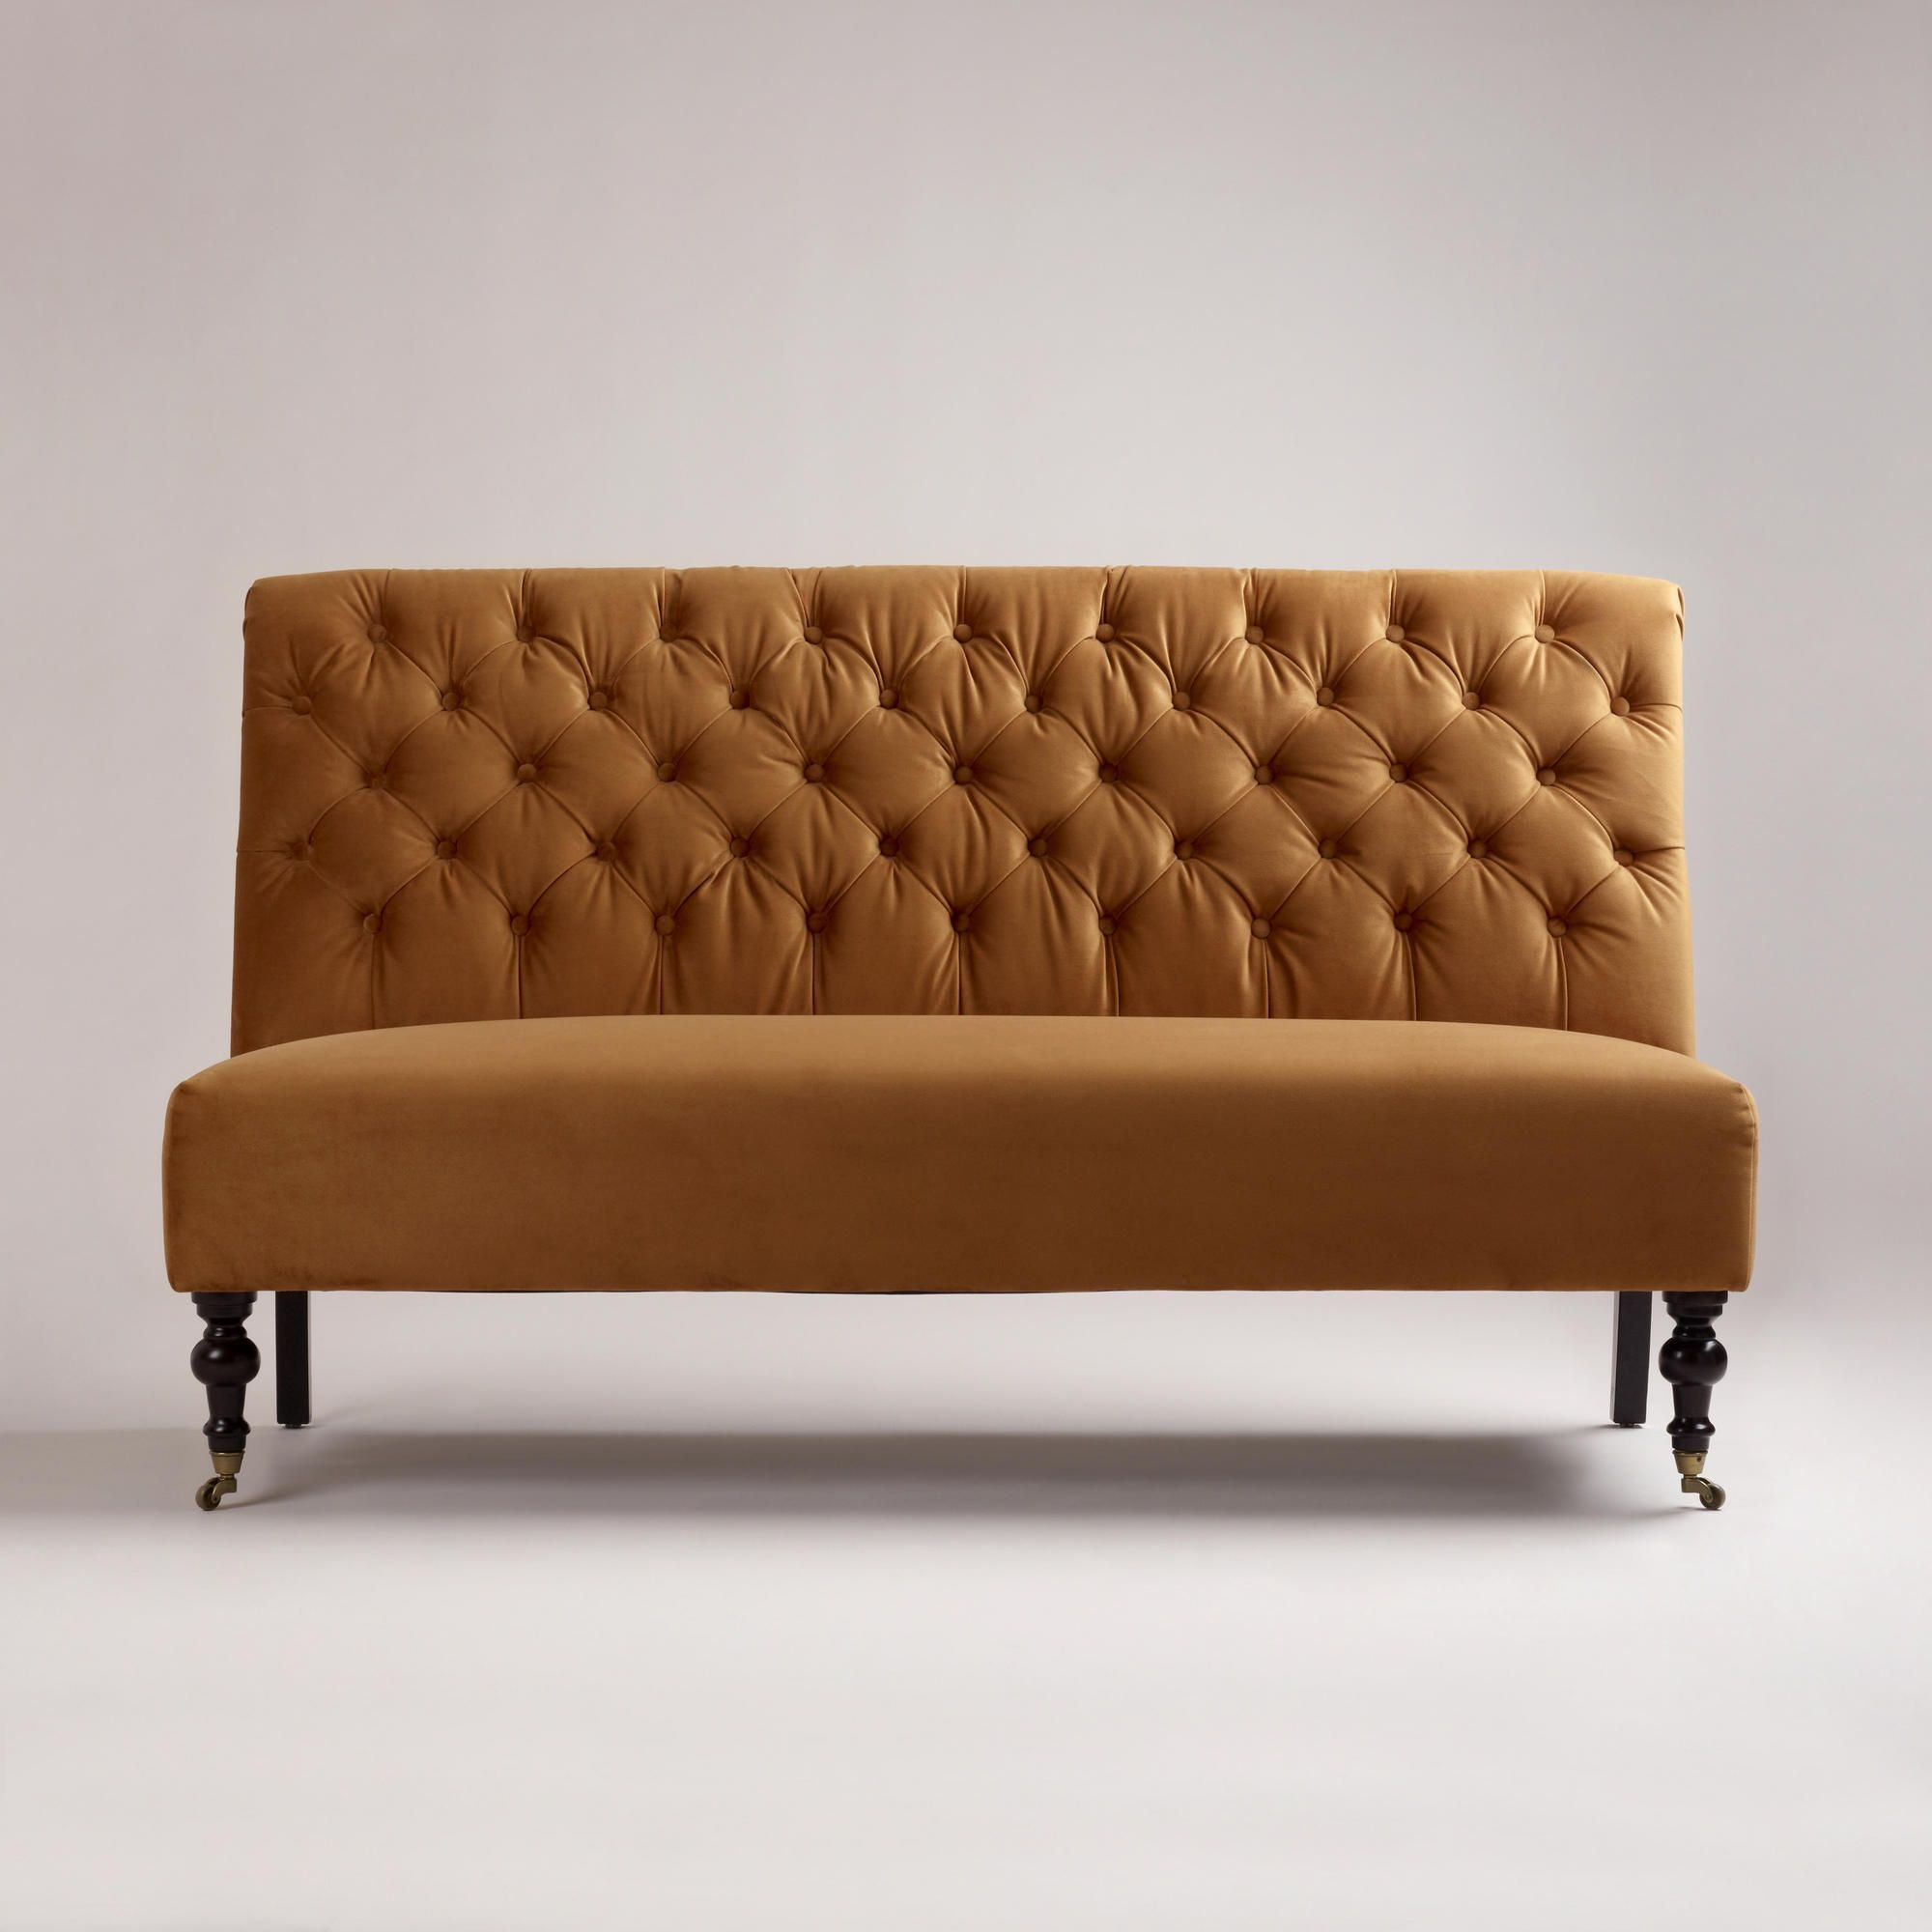 Charmant Sofa With No Back